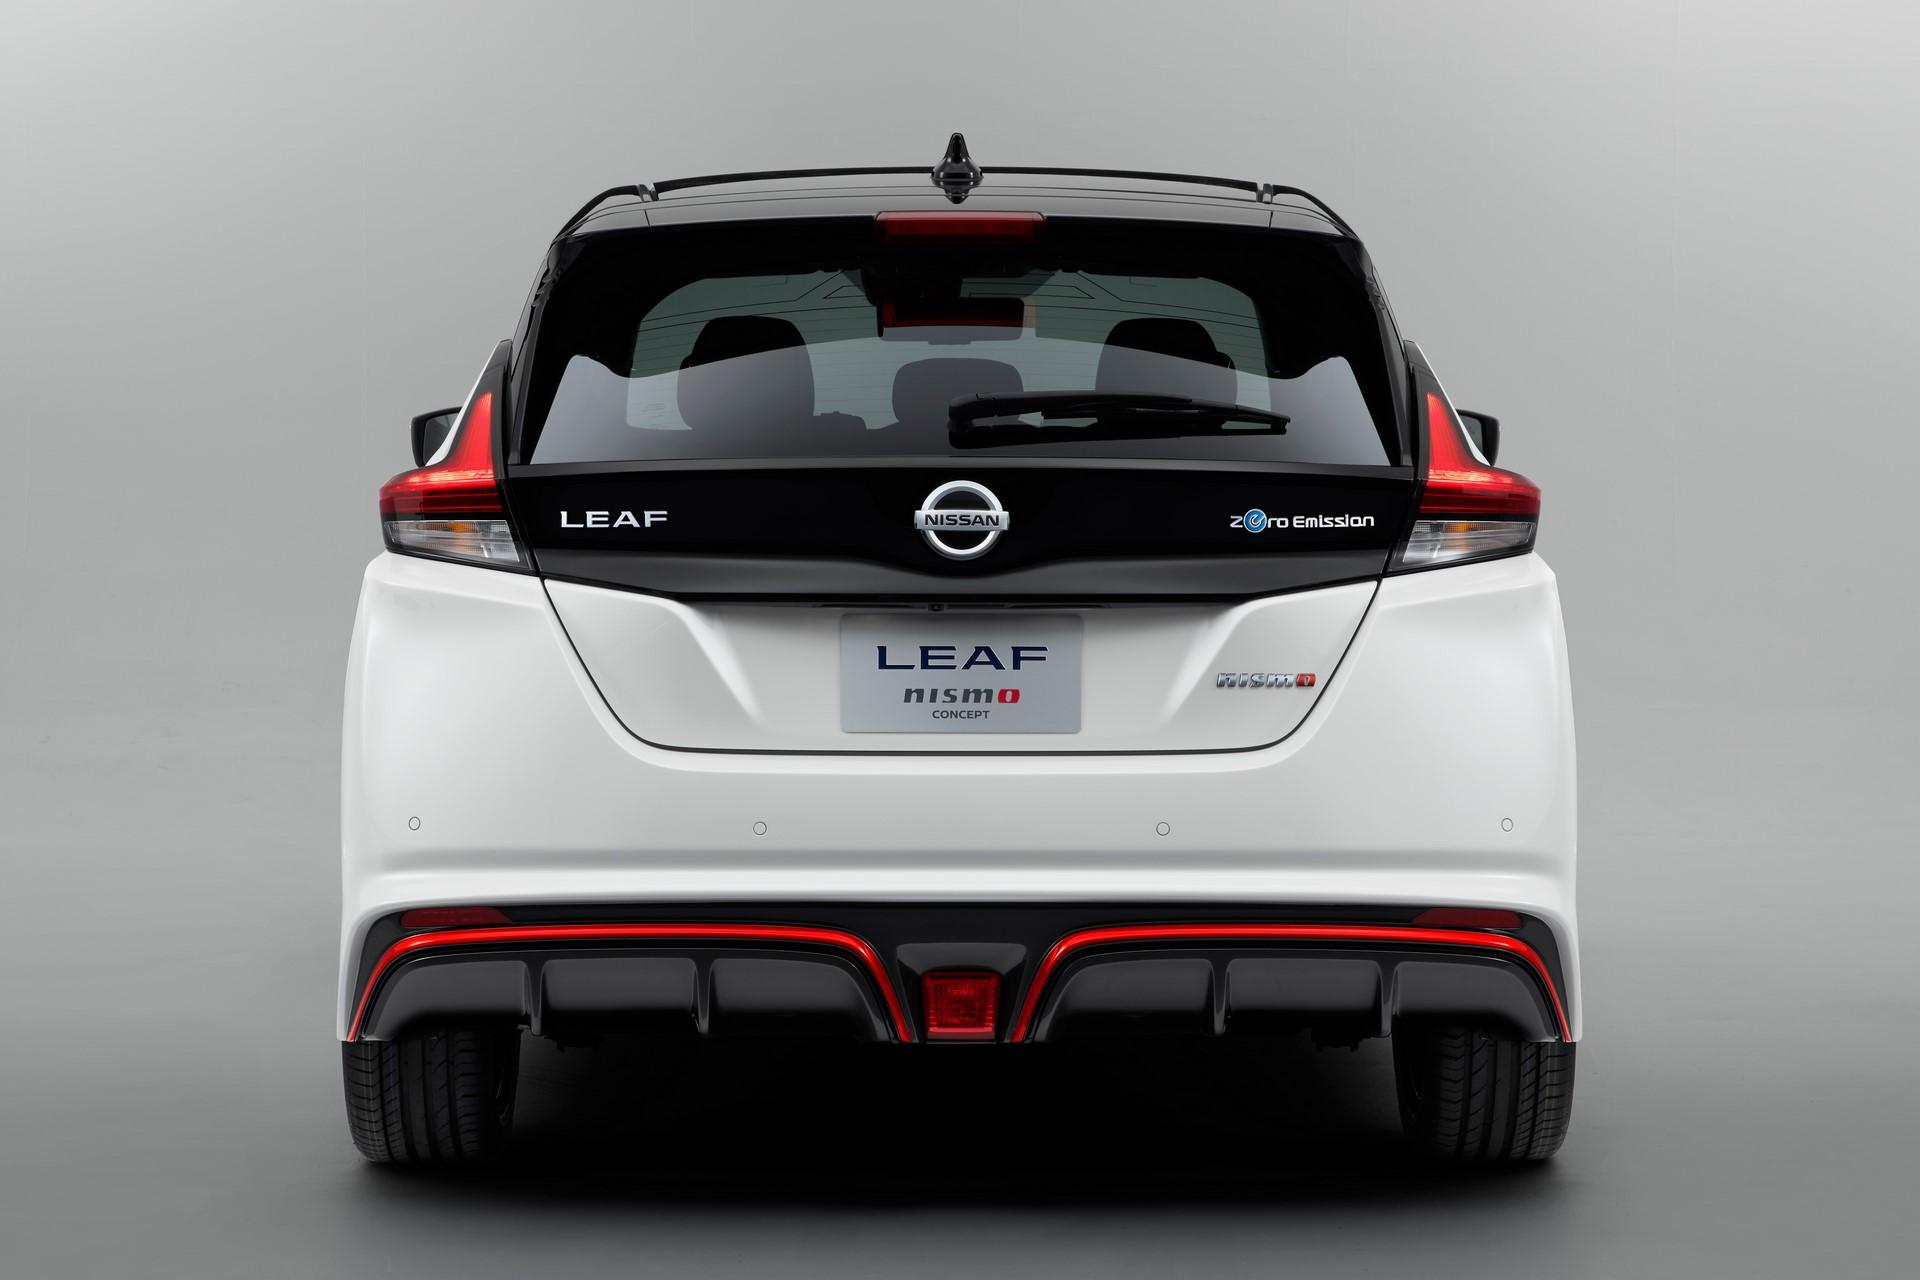 Nissan Leaf Nismo Concep (6)